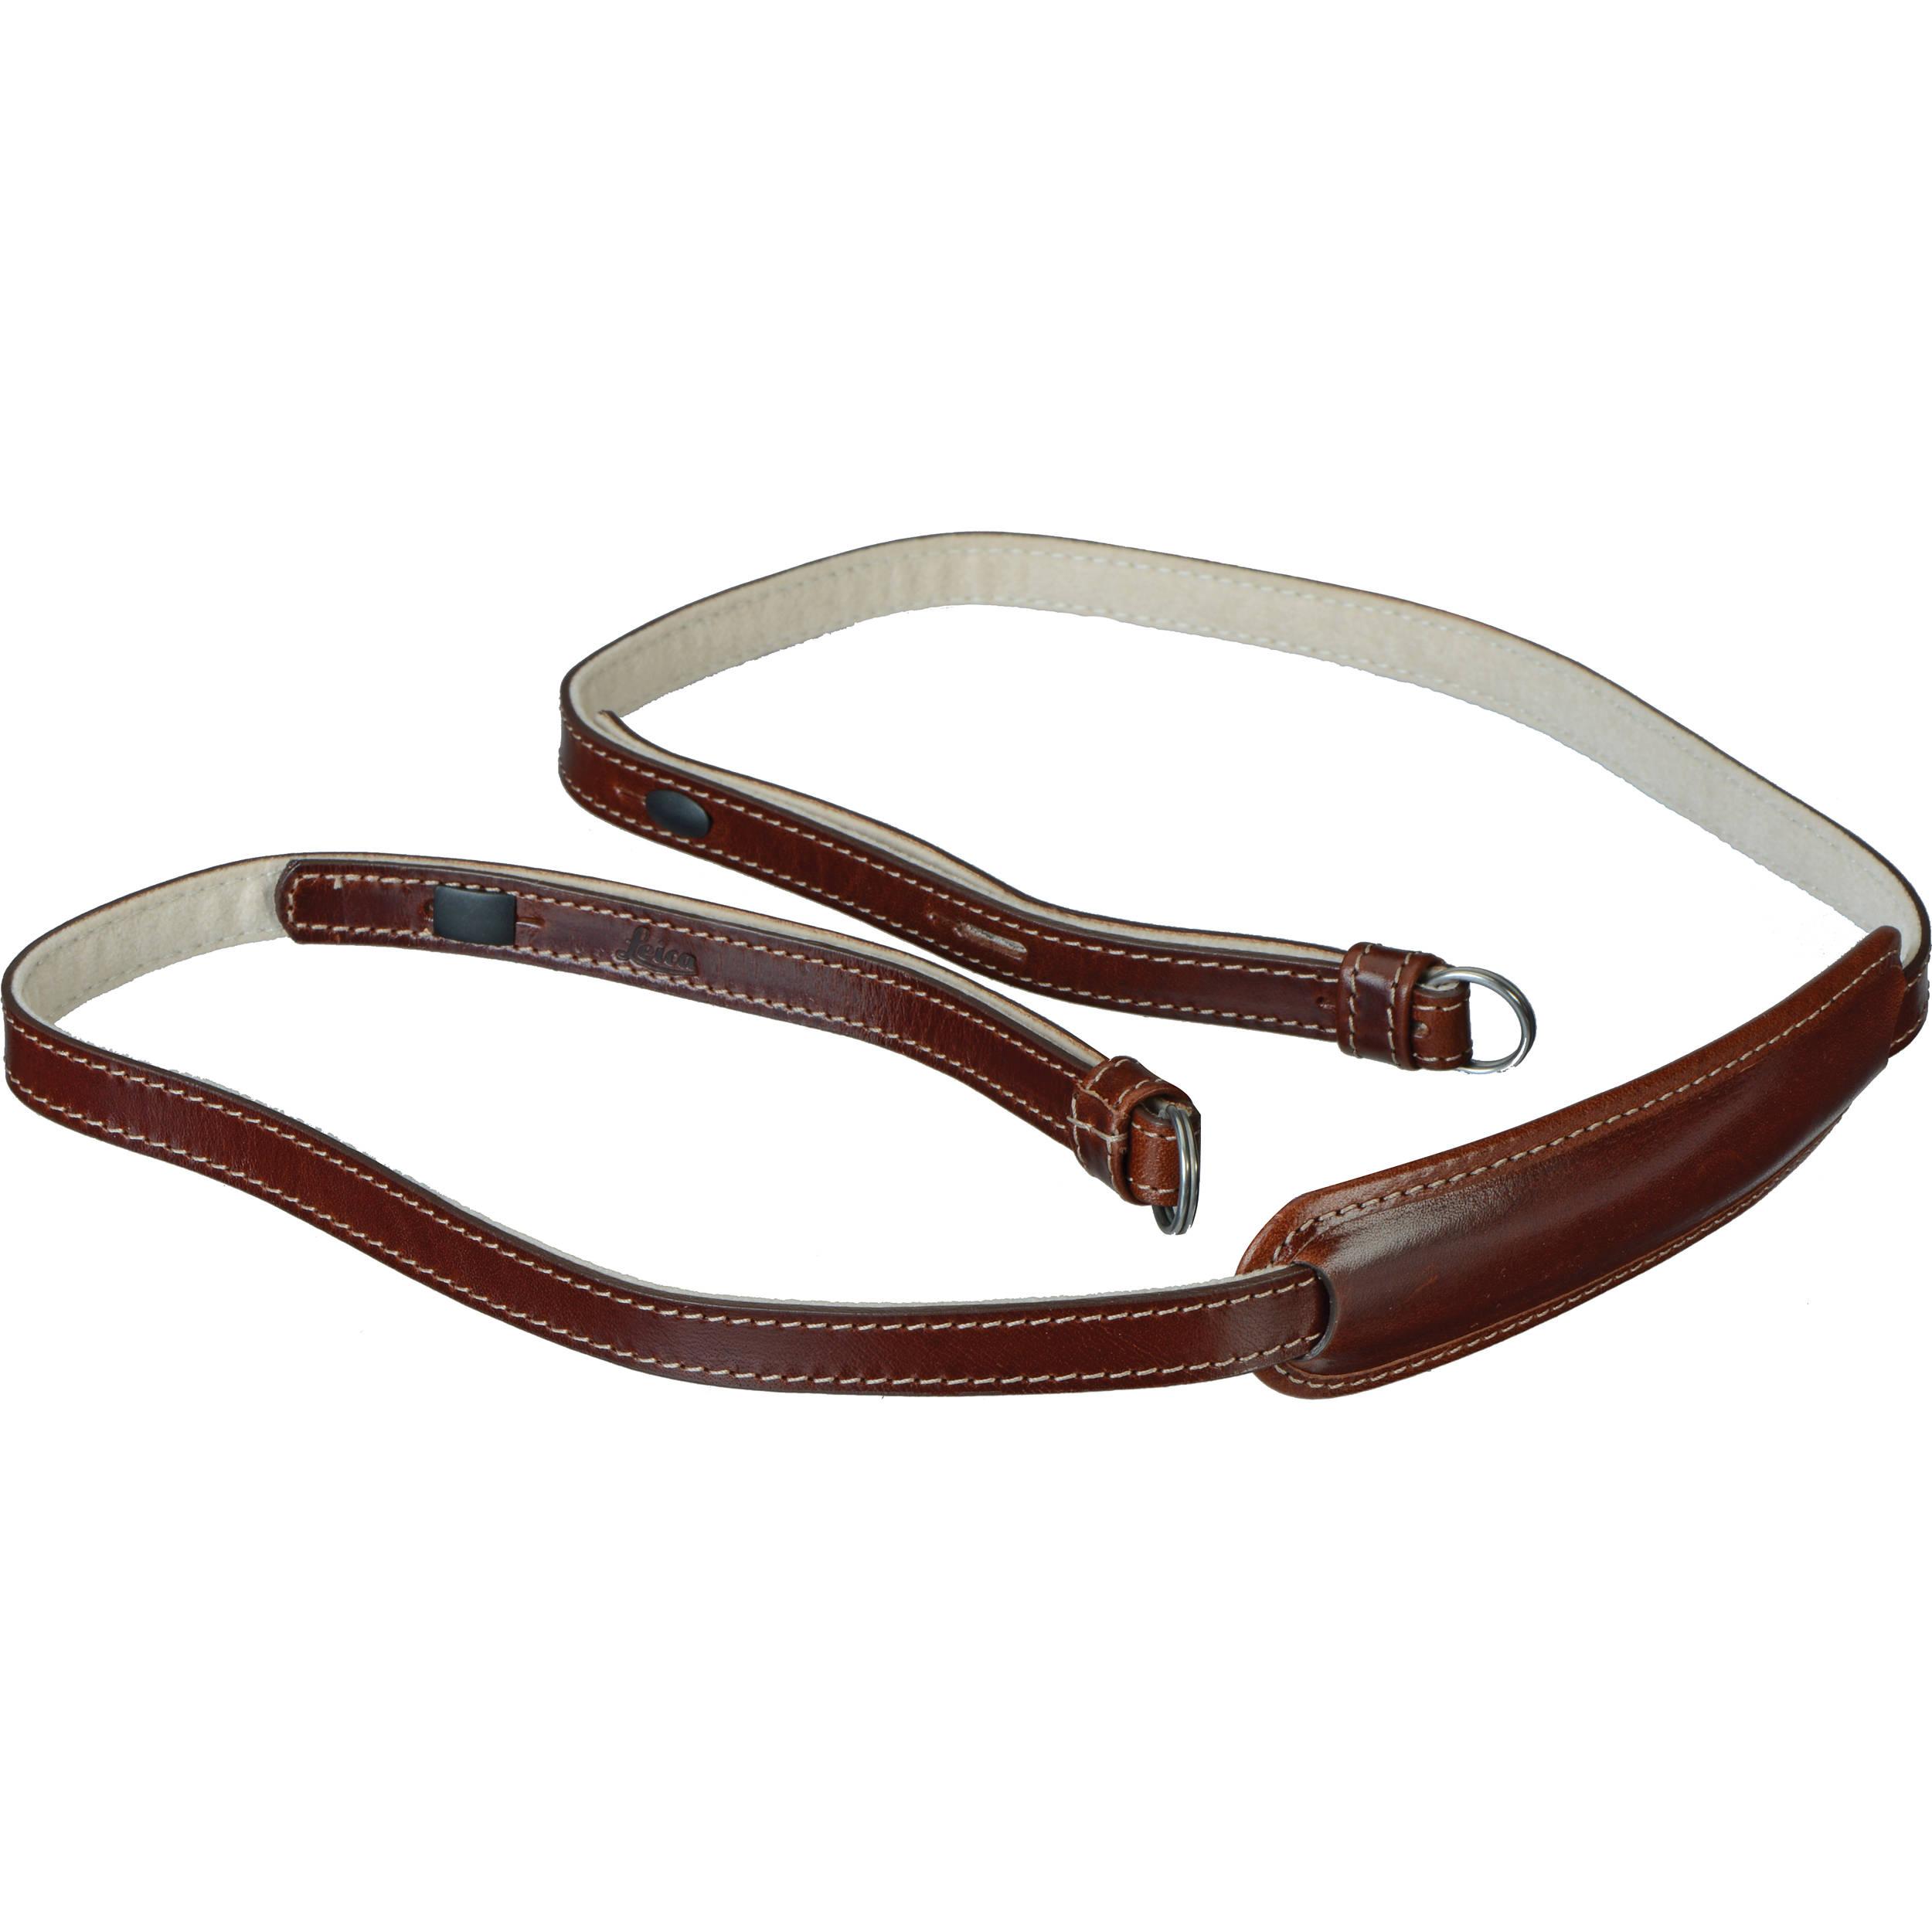 Leica Leather Neck Strap for Leica X and Leica X-E Cameras (Brown )